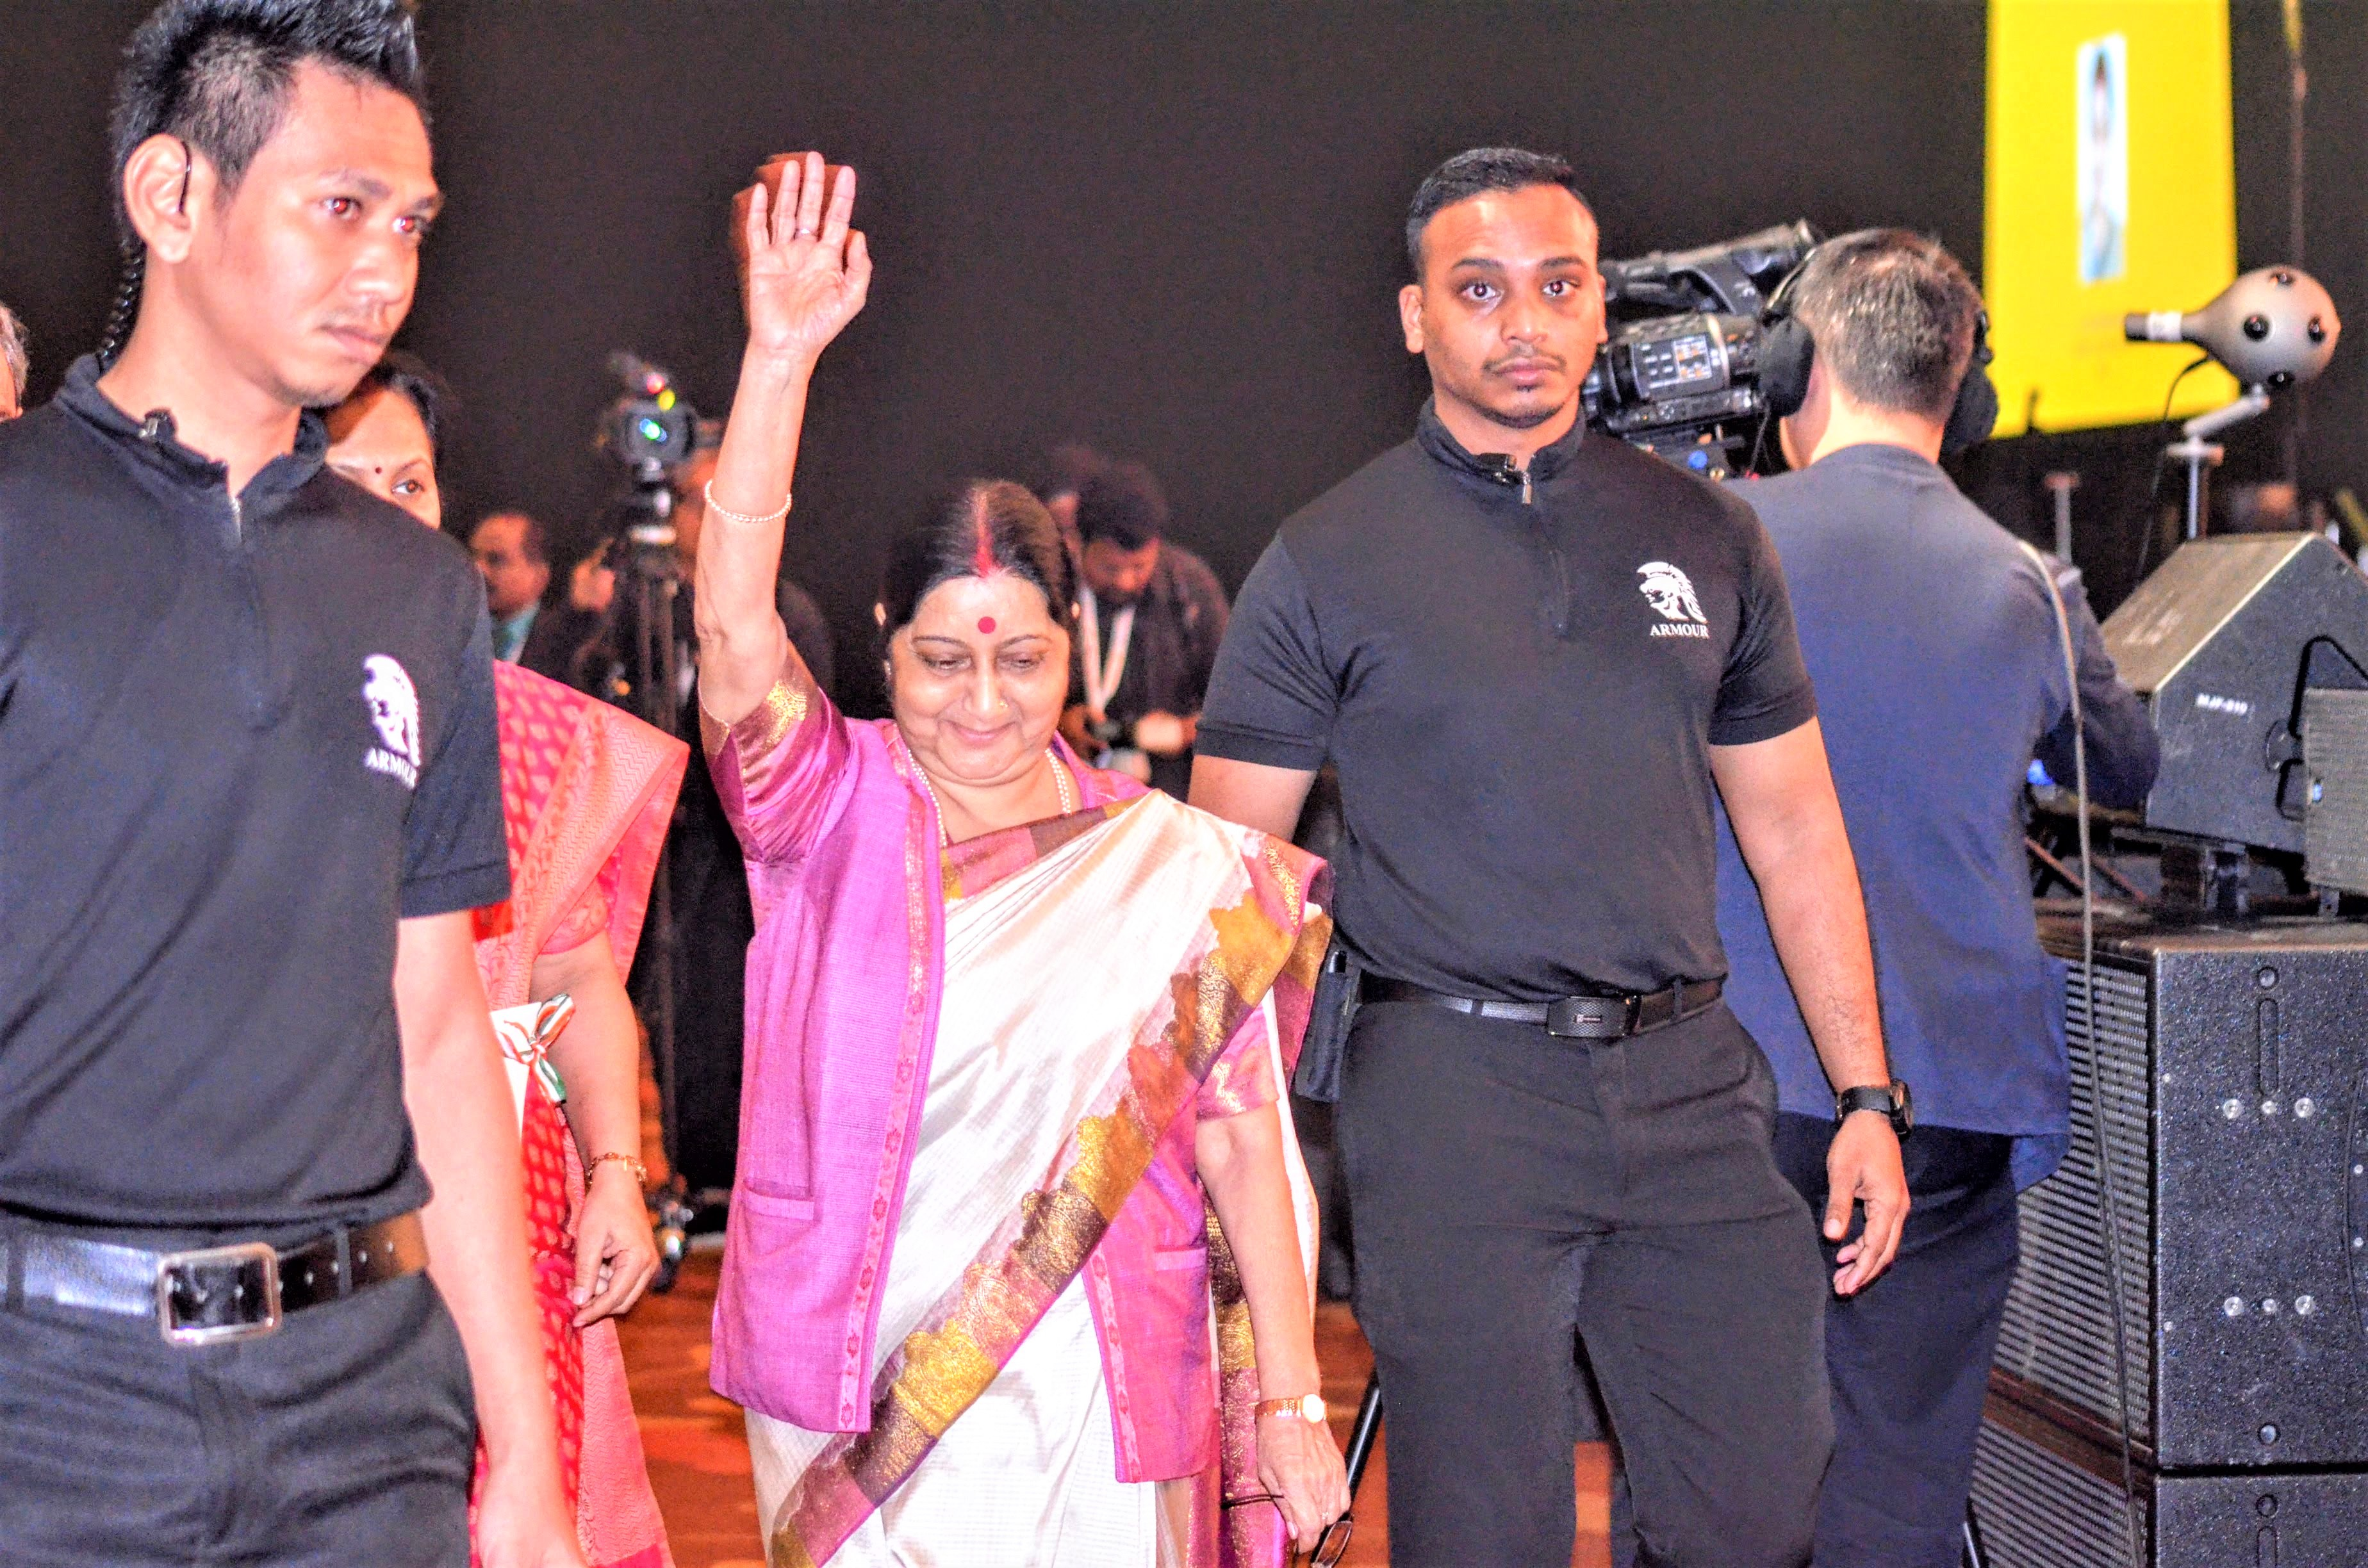 Indian Minister of External Affairs Sushma Swaraj waves hand to Indian diaspora while arriving at the Pravasi Bharatiya Divas at Marina Bay Sands.